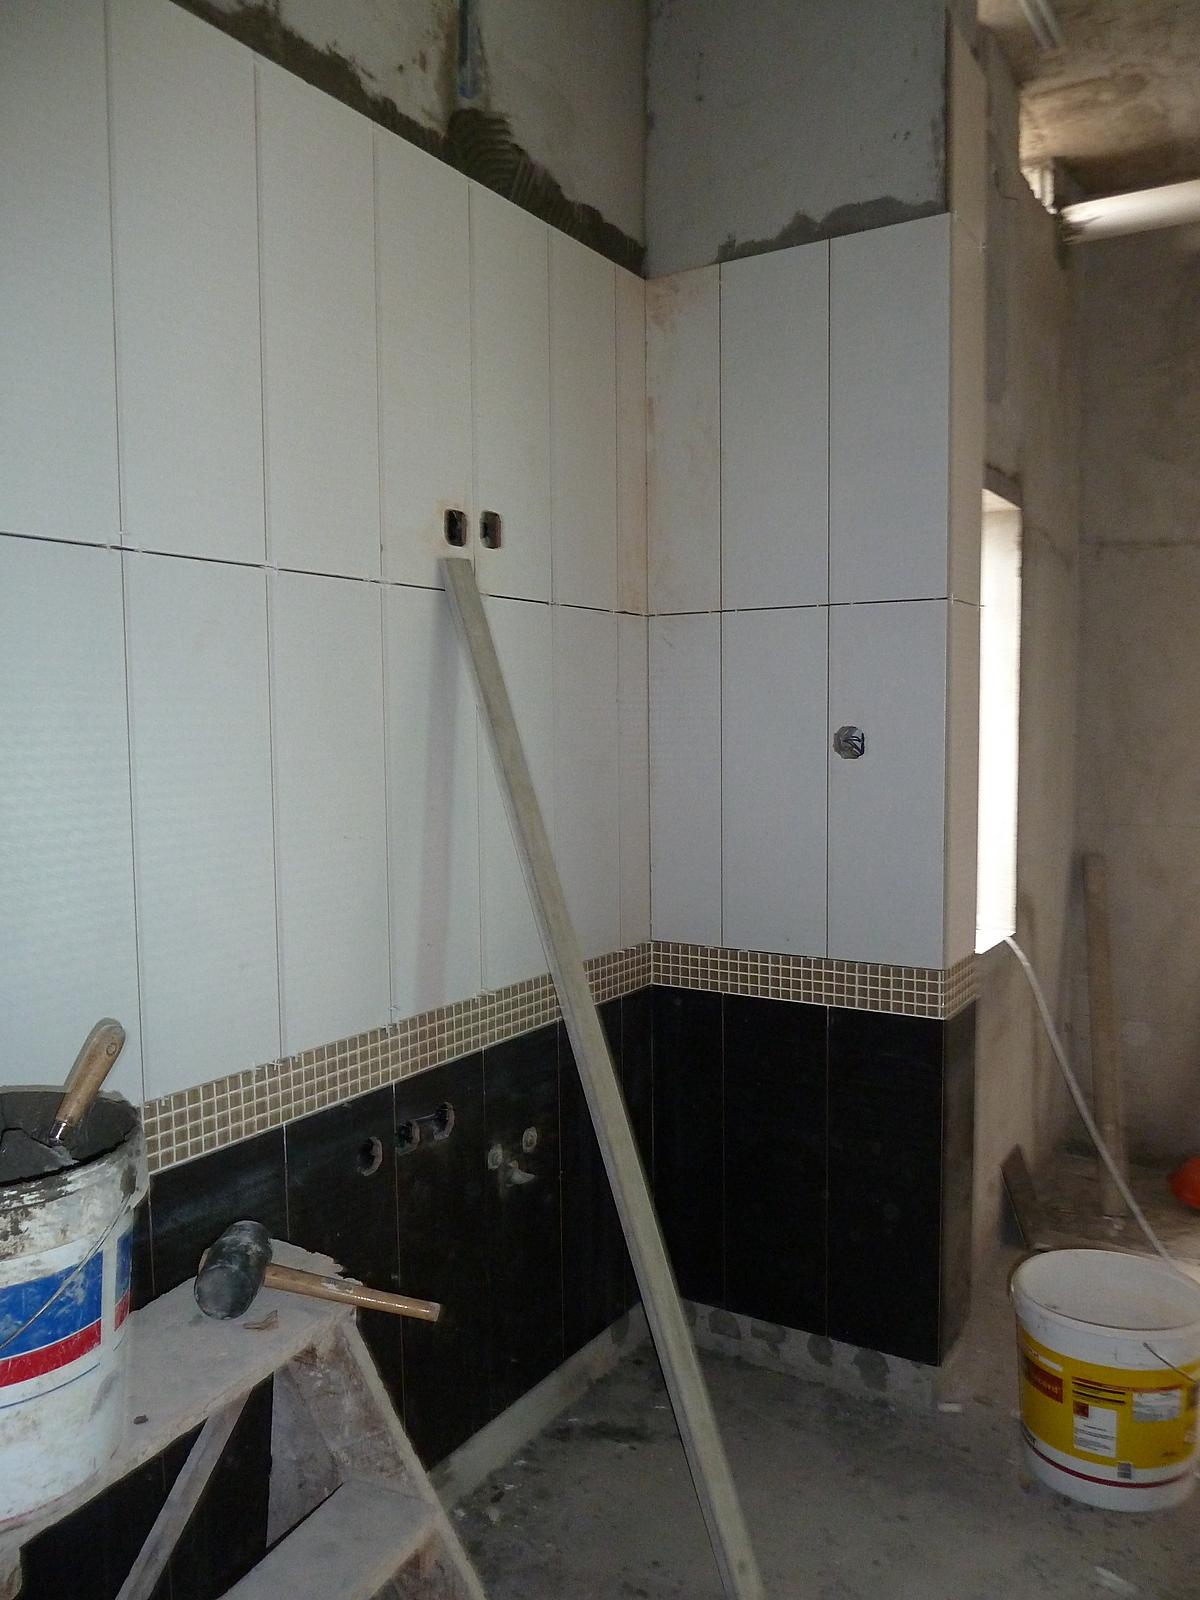 05/11/11: Master Bathroom #3 in progress